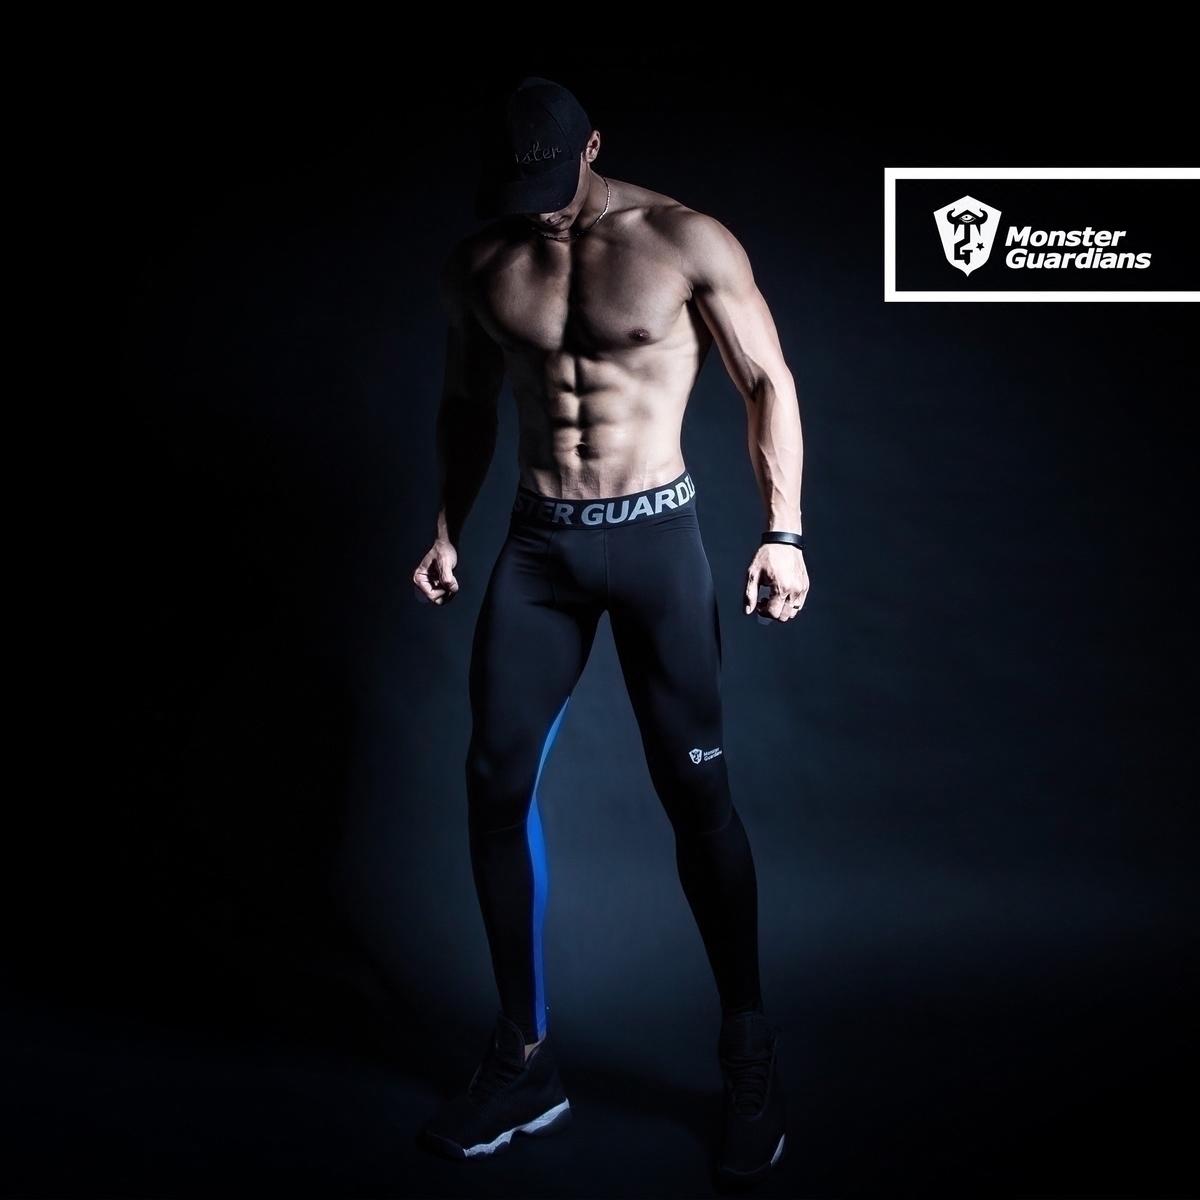 Monster Guardians 男子運動健身訓練緊身褲壓縮褲